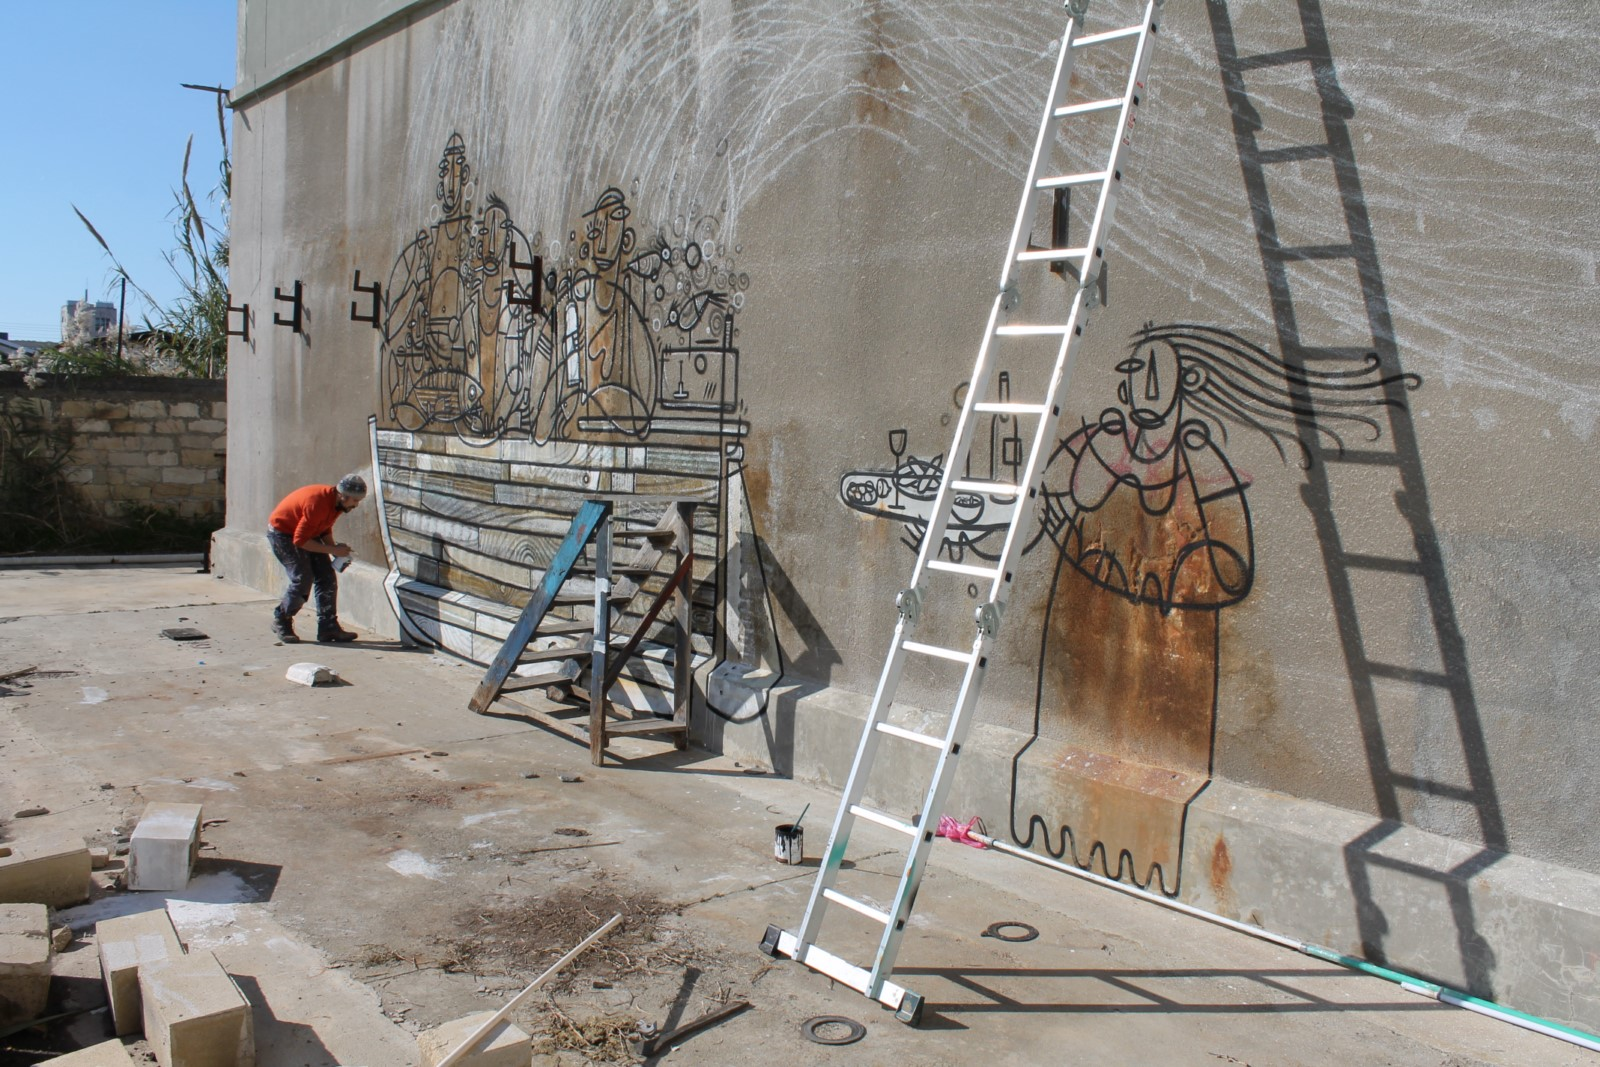 adec ad ec artiste peintre street